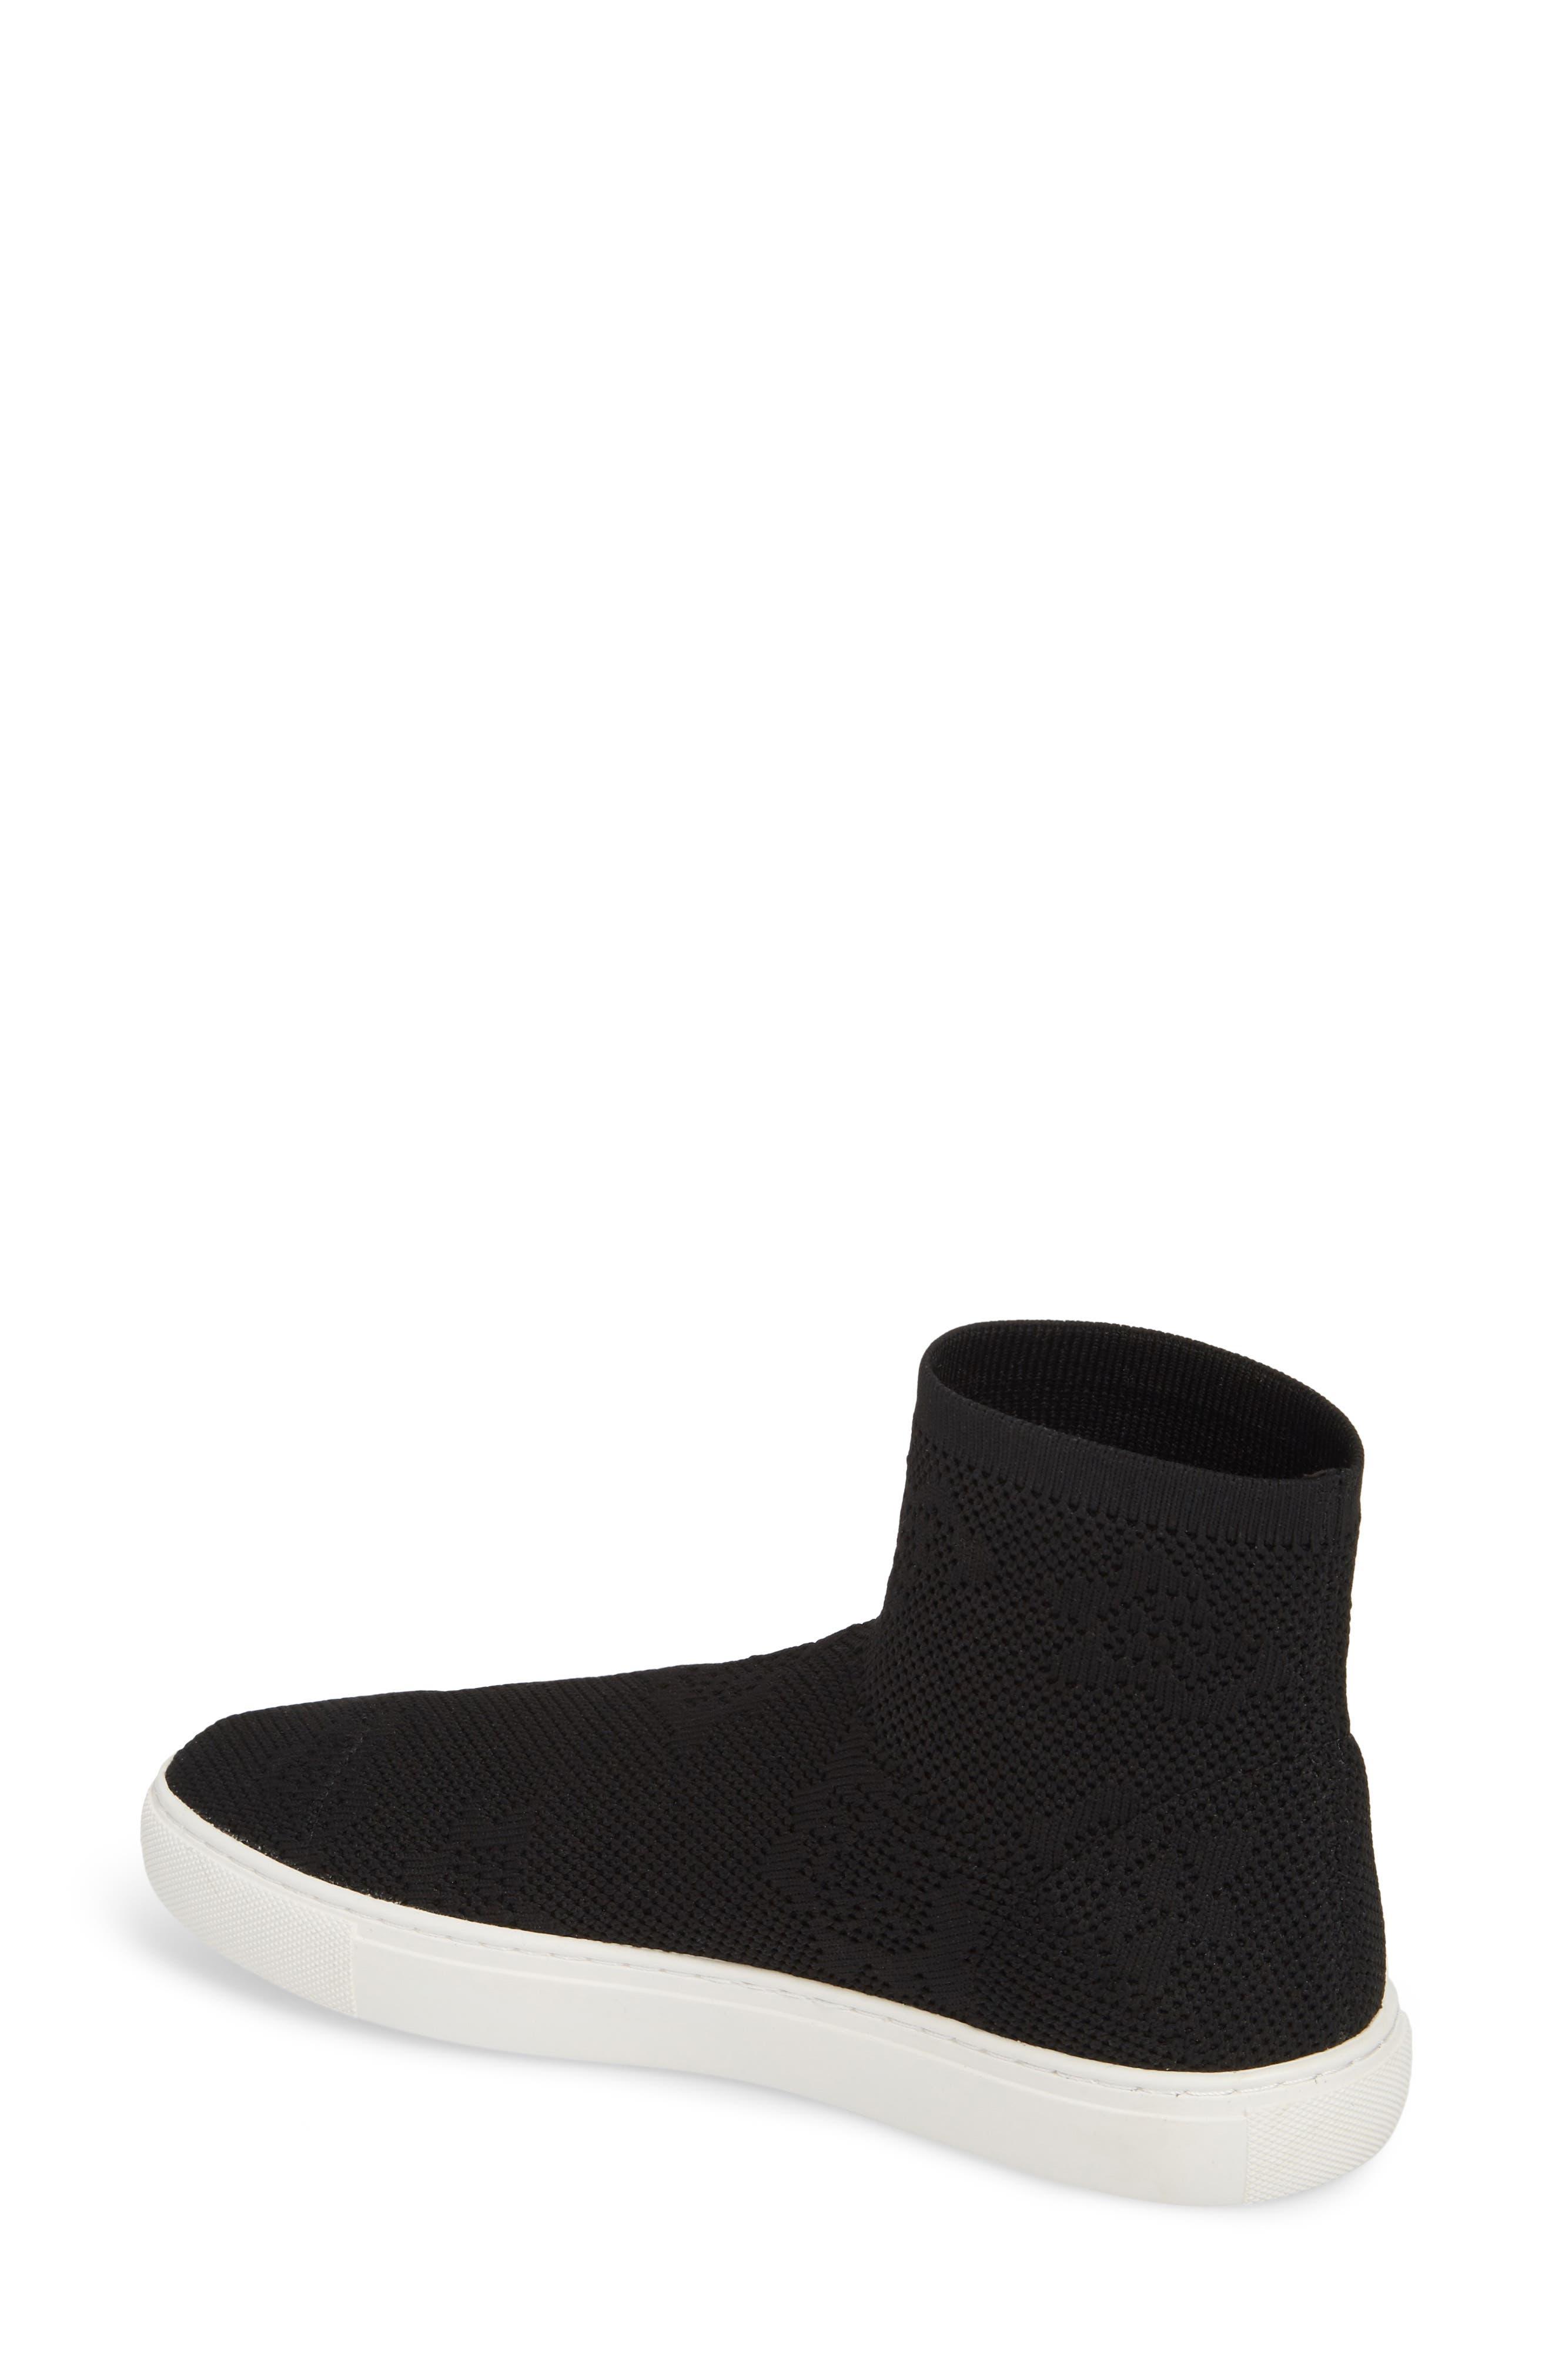 Keating Sneaker,                             Alternate thumbnail 2, color,                             001